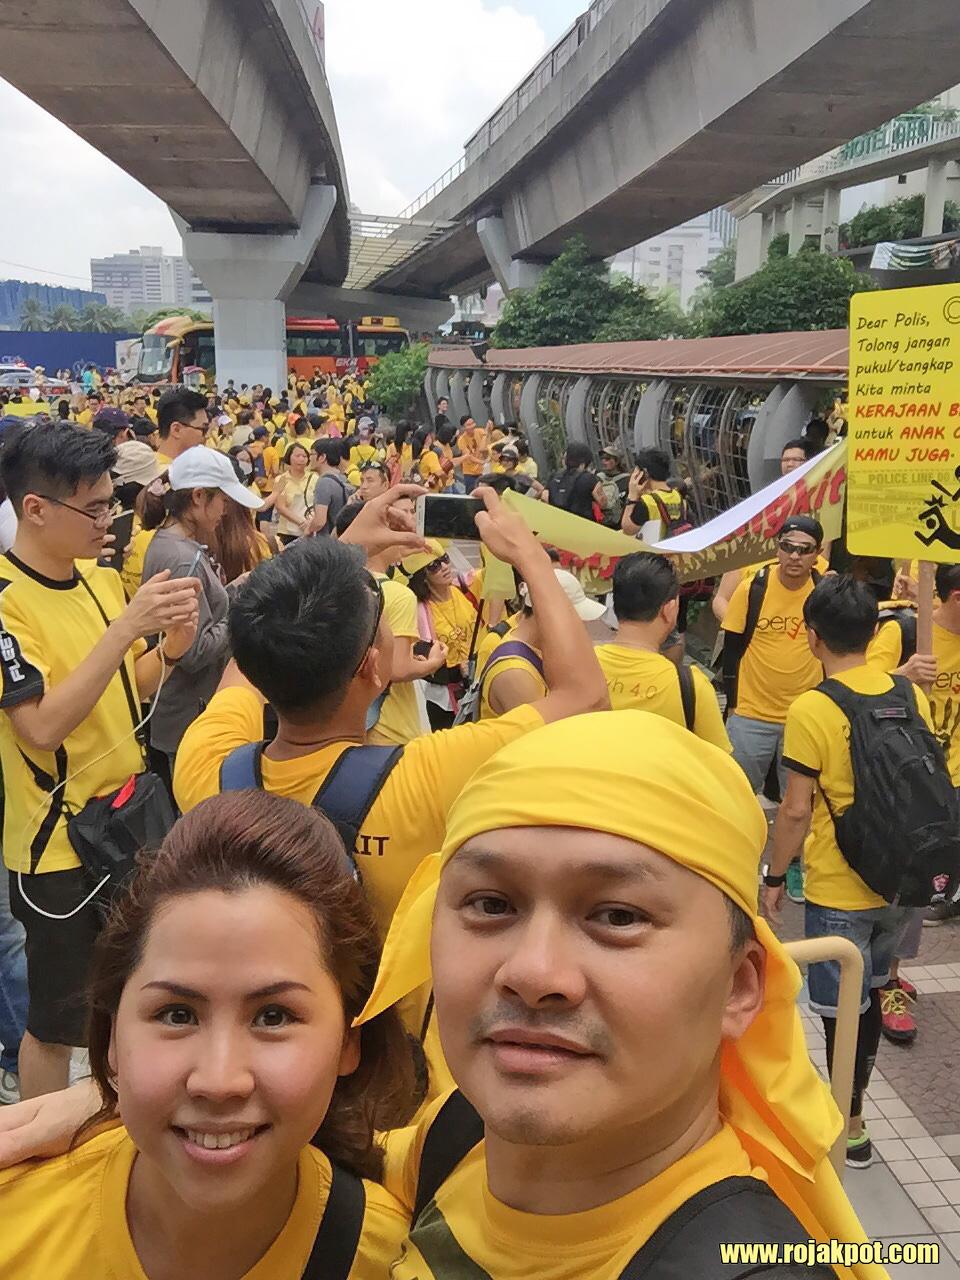 Dr. Michelle Mah at Bersih 4